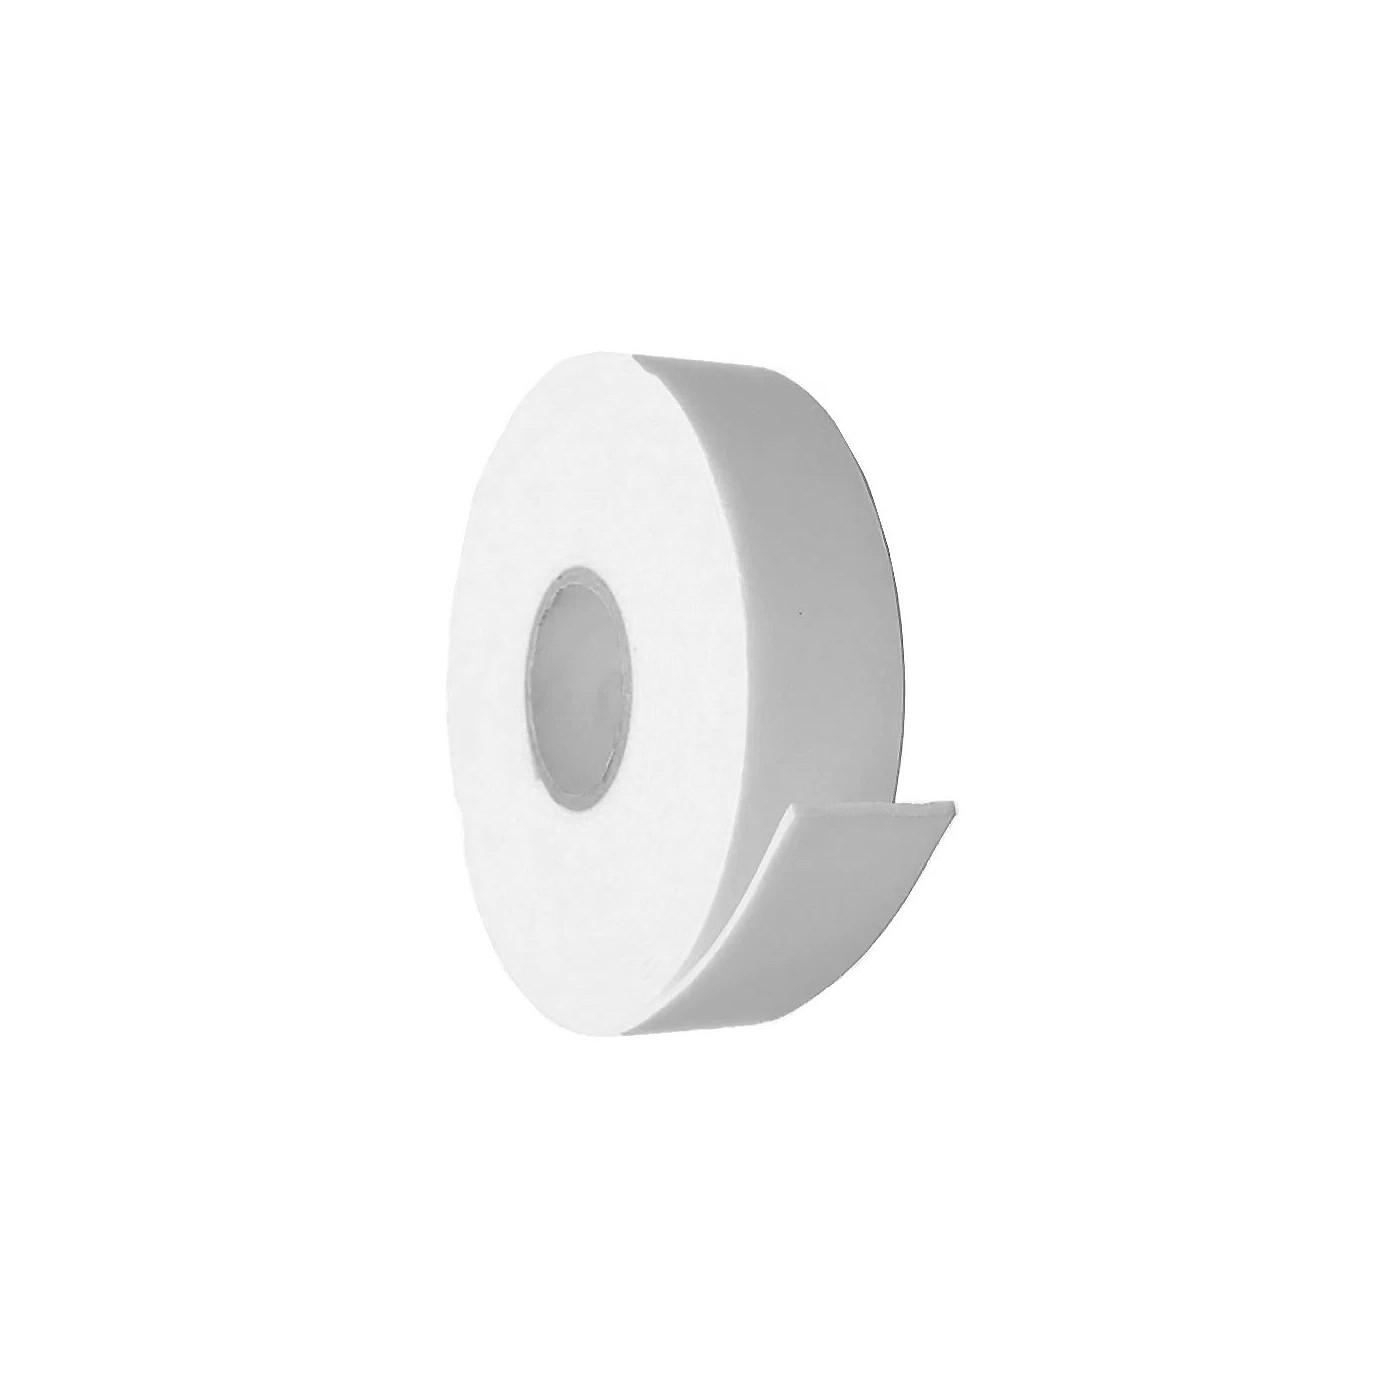 12 rolls of double sided foam tape (24 meters x 18 mm), white